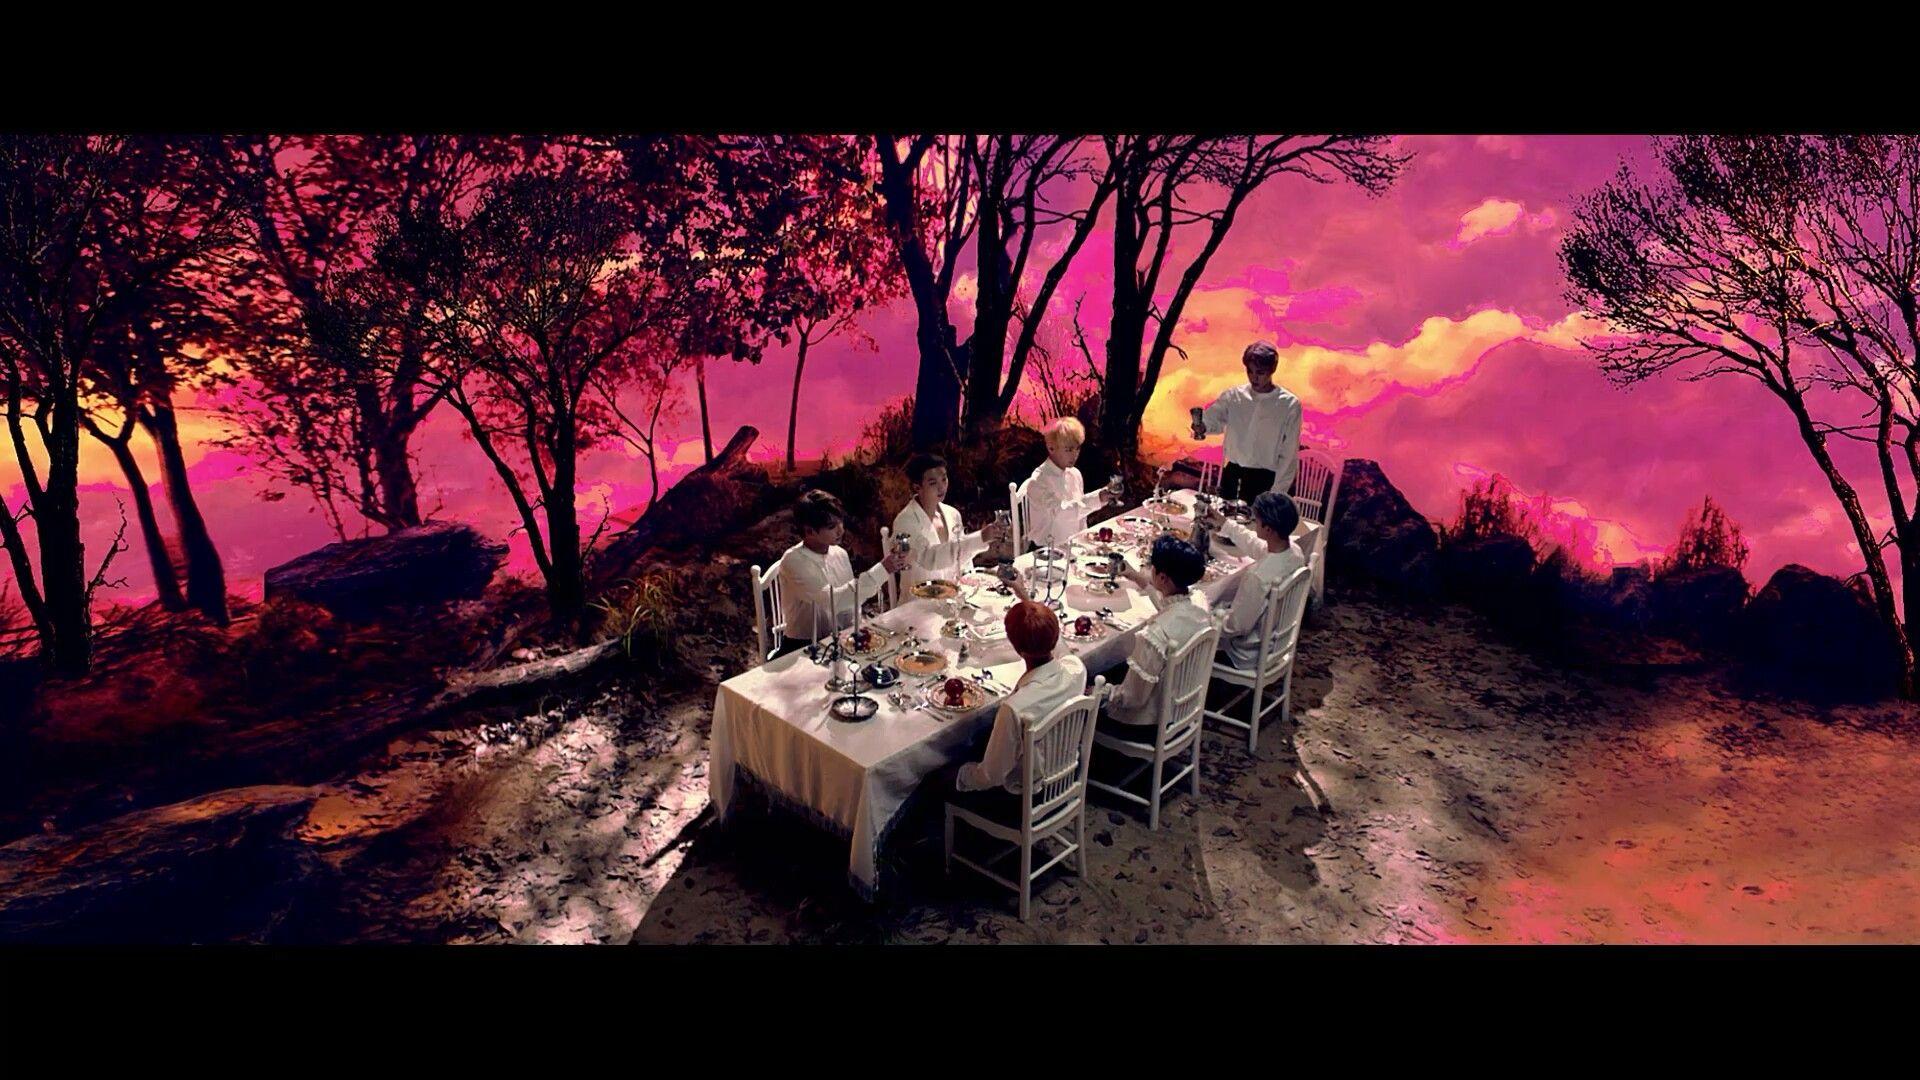 Bangtan Family Dinner ❤ 방탄소년단 (BTS) '피 땀 눈물 (Blood Sweat & Tears)' MV #BTS #방탄소년단